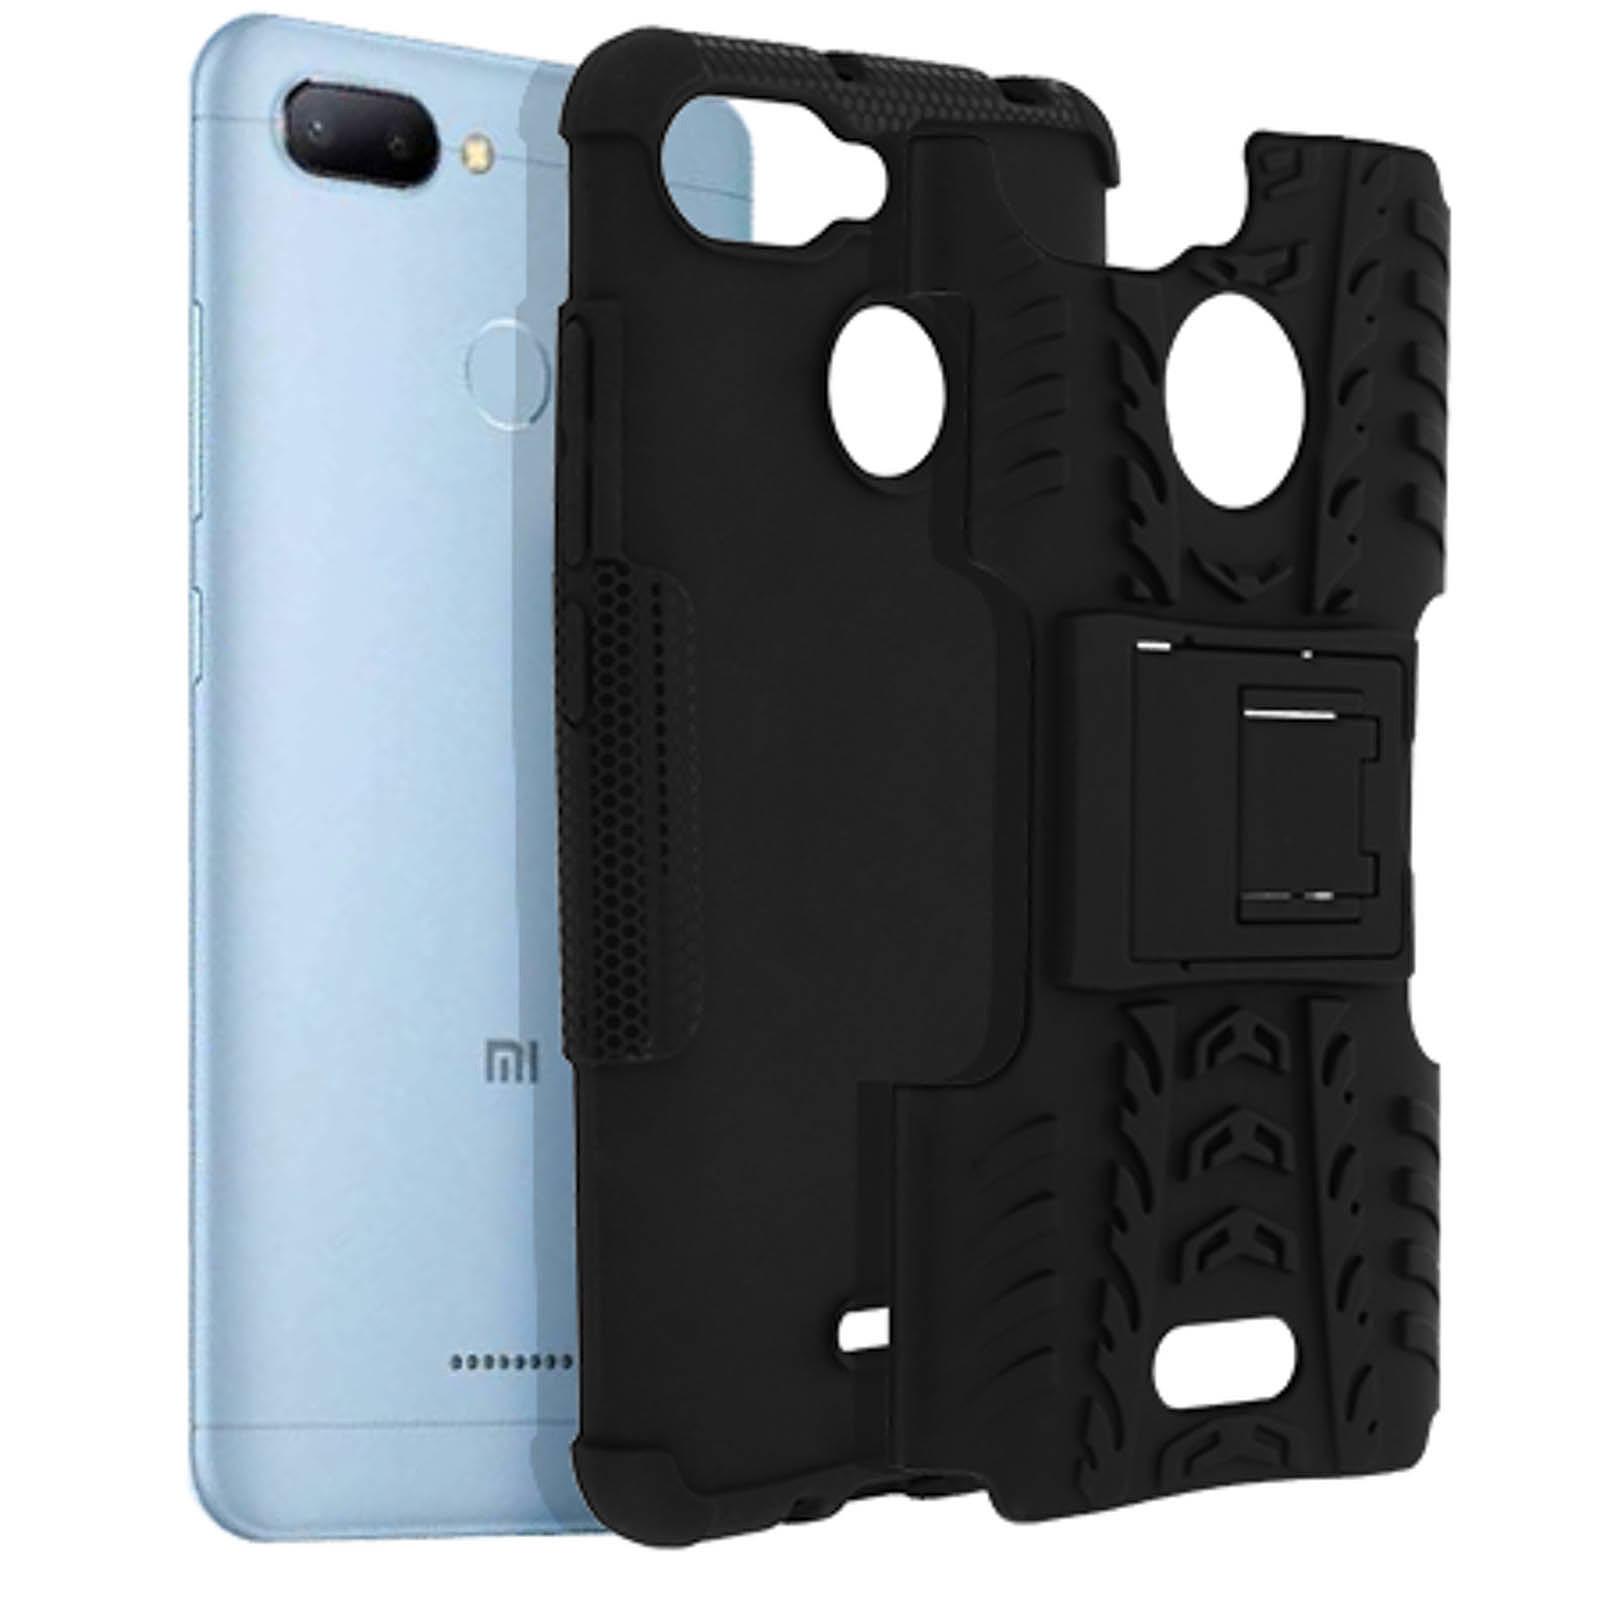 Avizar Coque Noir pour Xiaomi Redmi 6A, Xiaomi Redmi 6